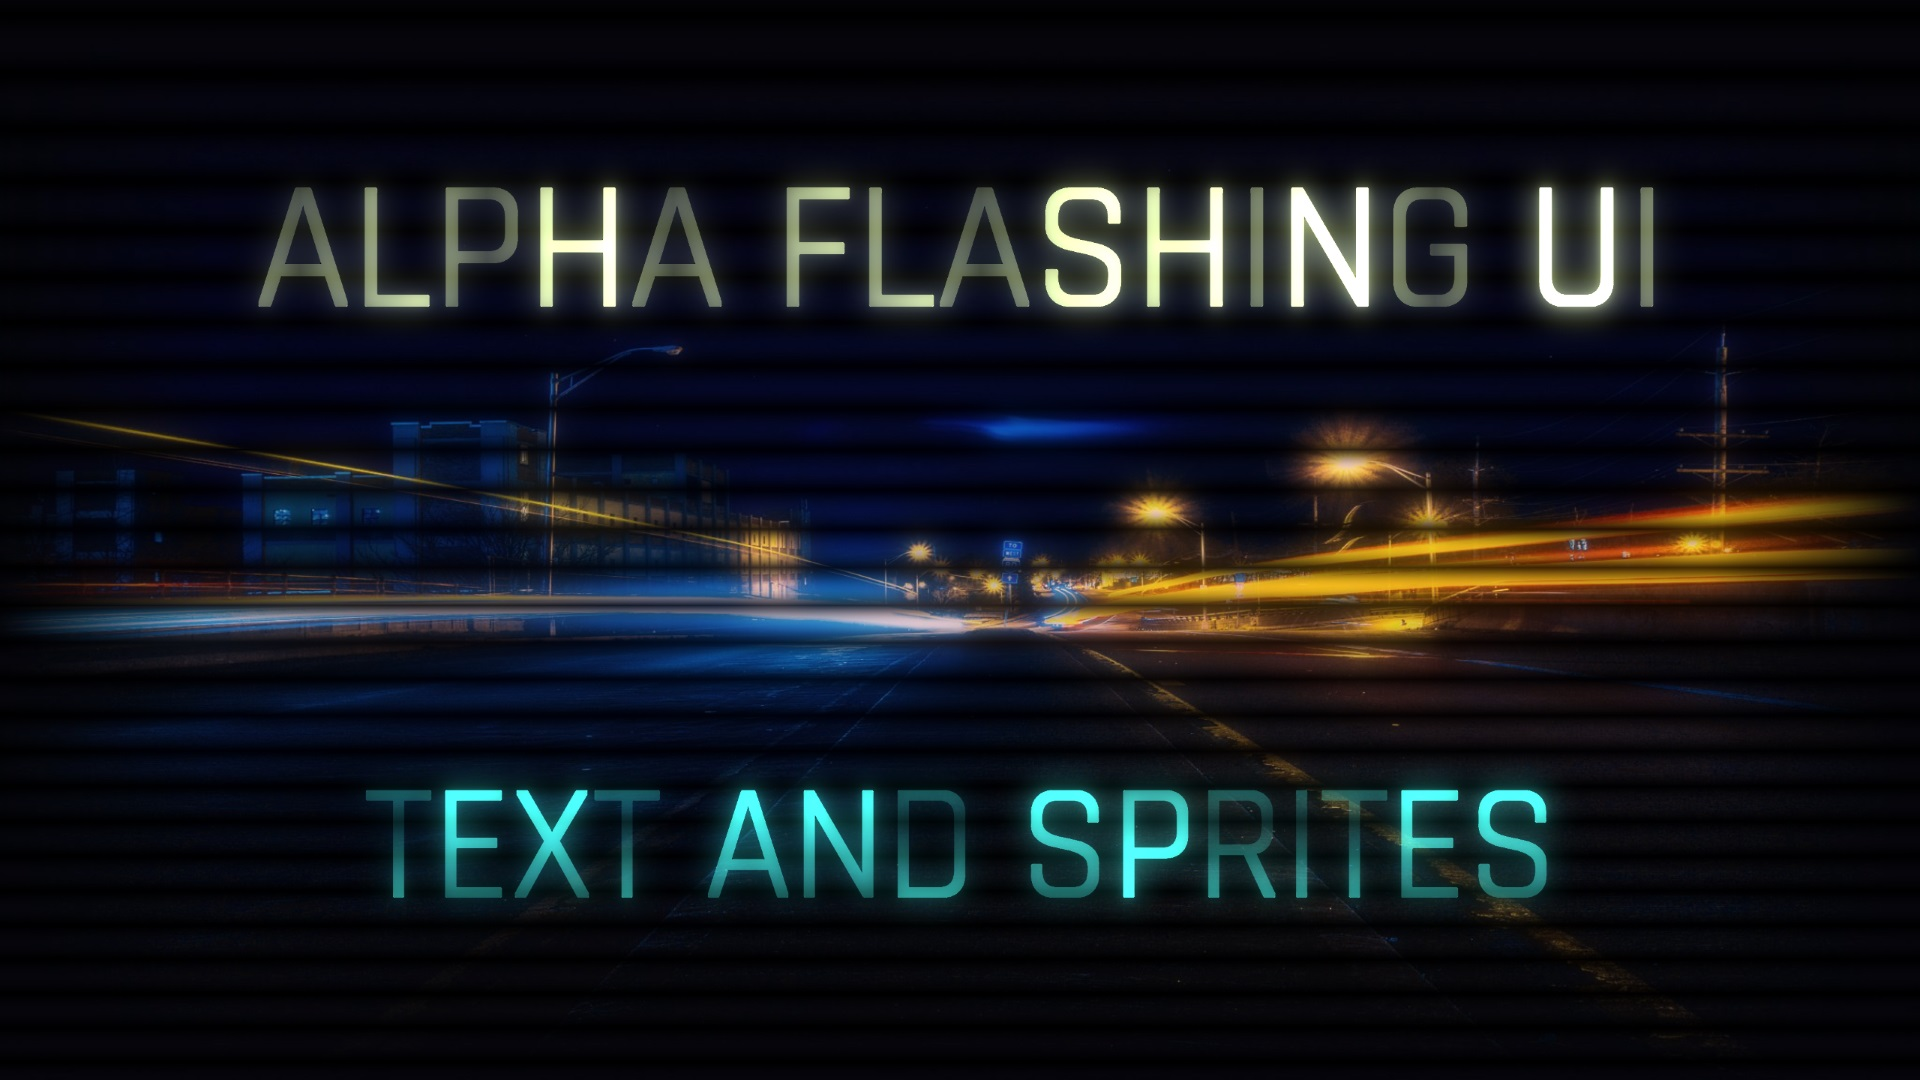 Alpha Flashing UI